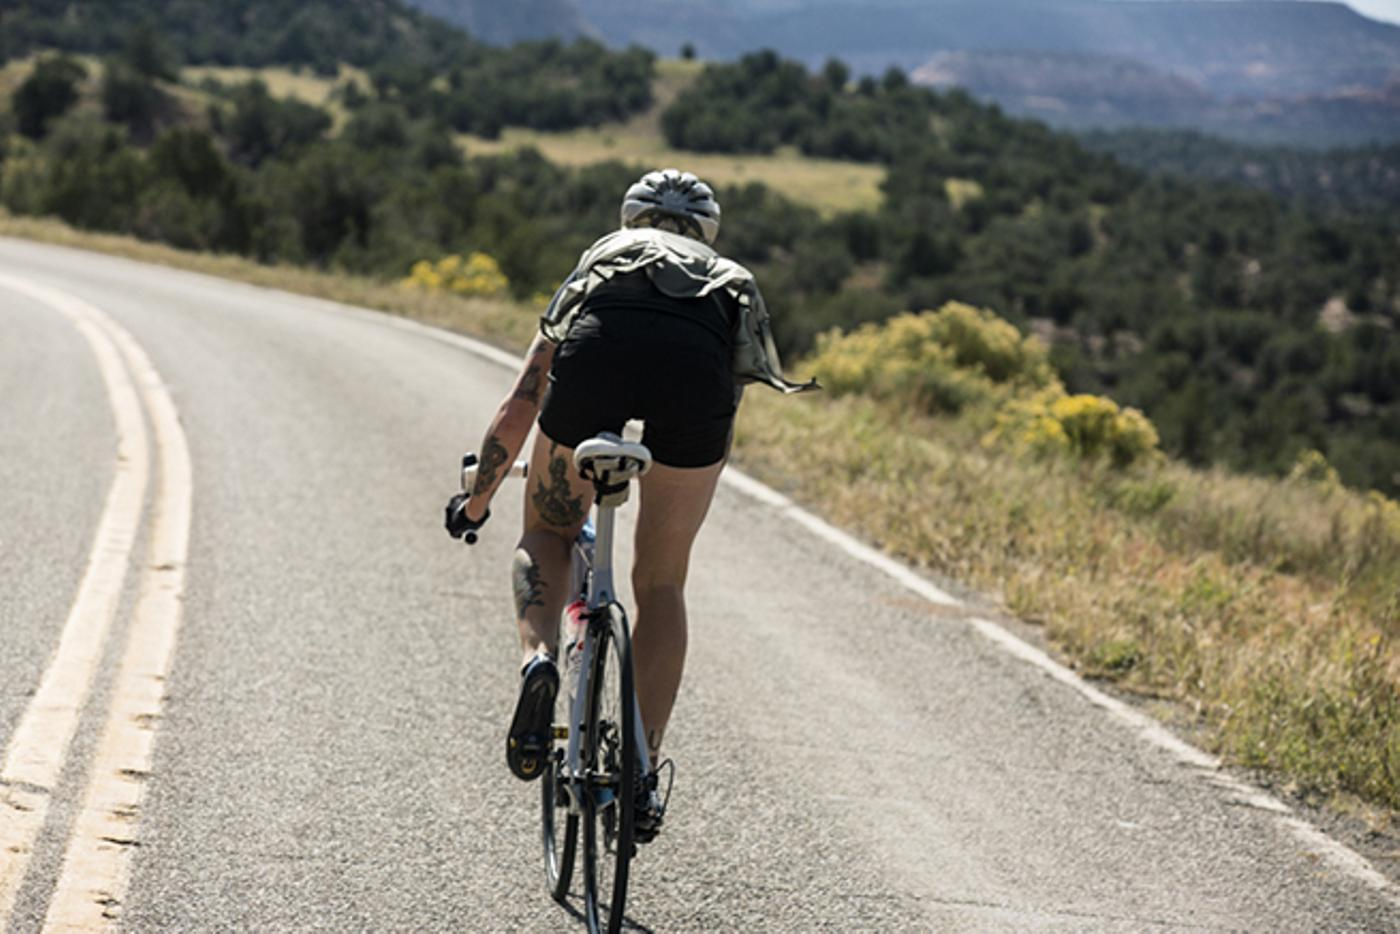 Giro_S14_Women_Ride_Look_131007_GIRO_2_3-2871